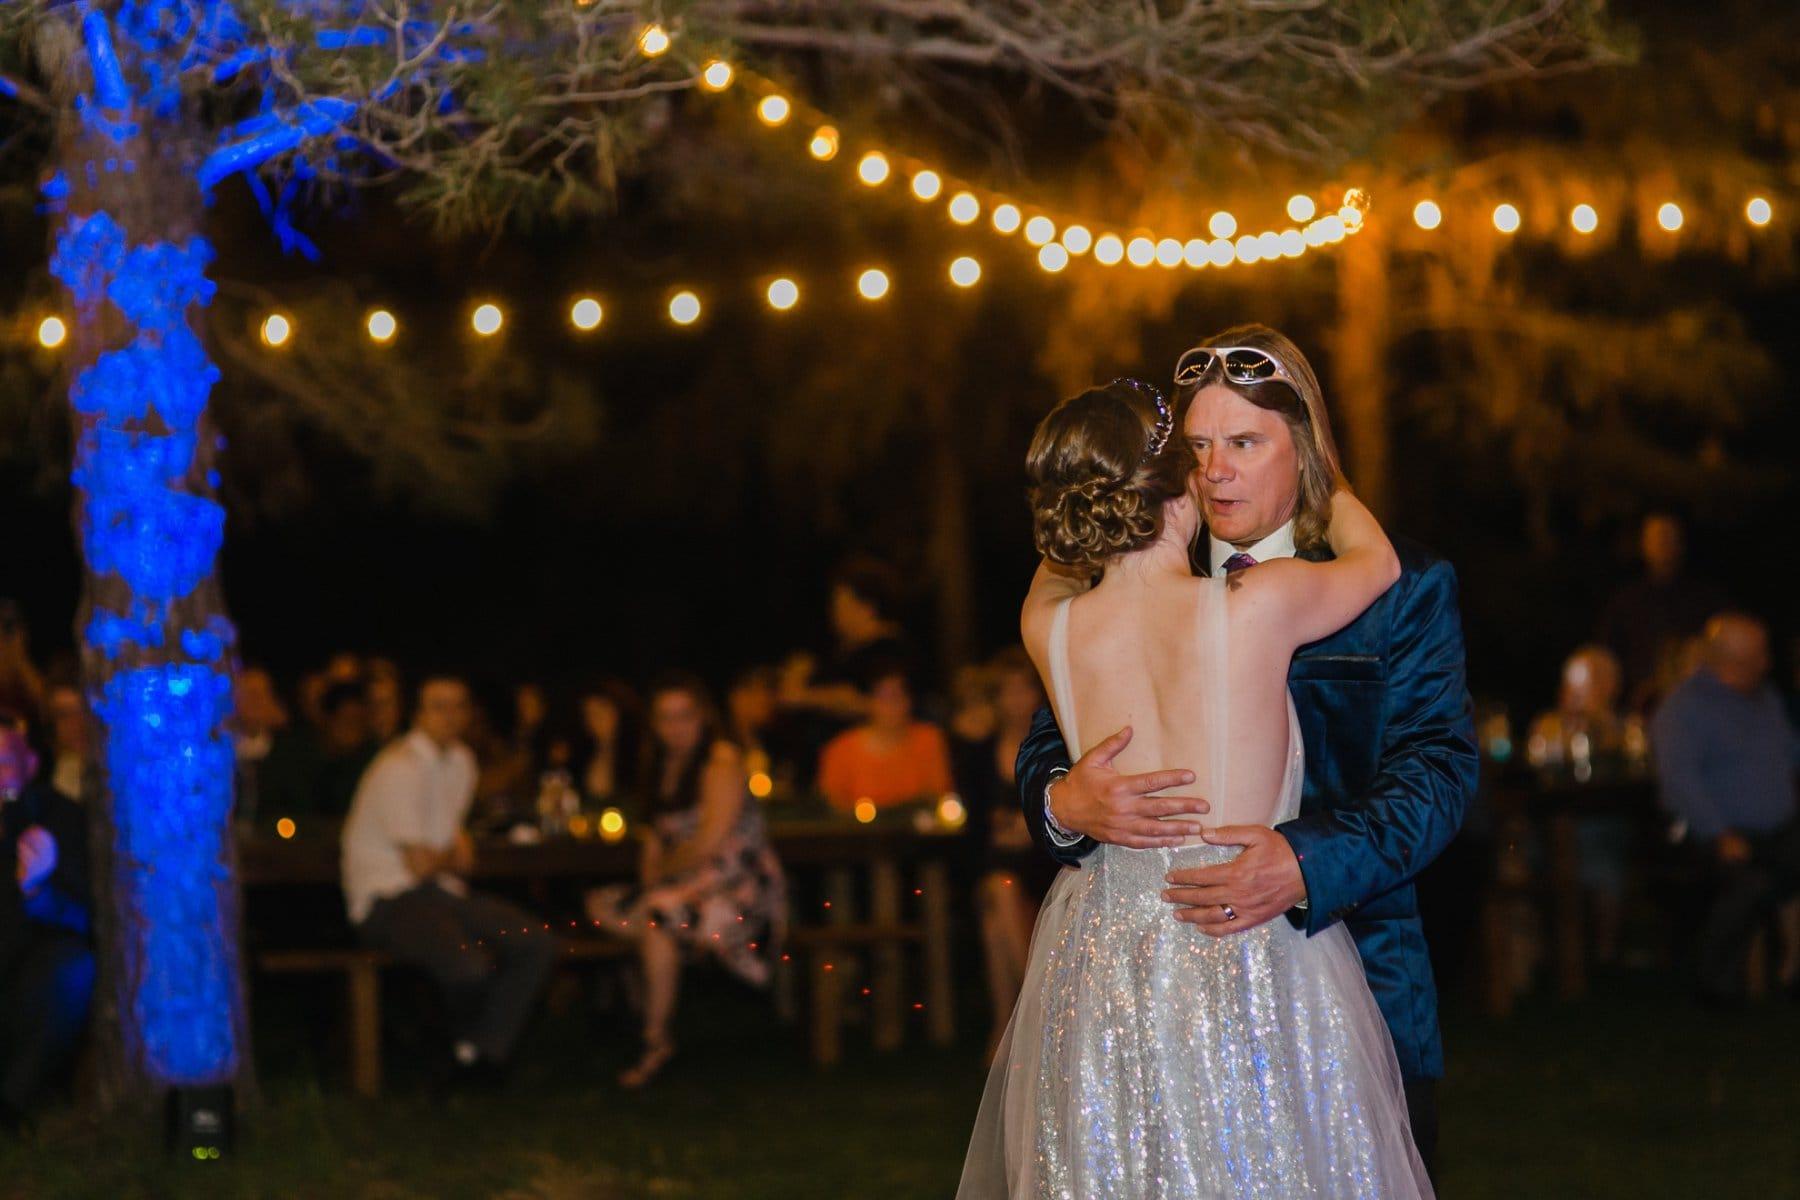 wedding reception at the Meadow Schnepf Farms